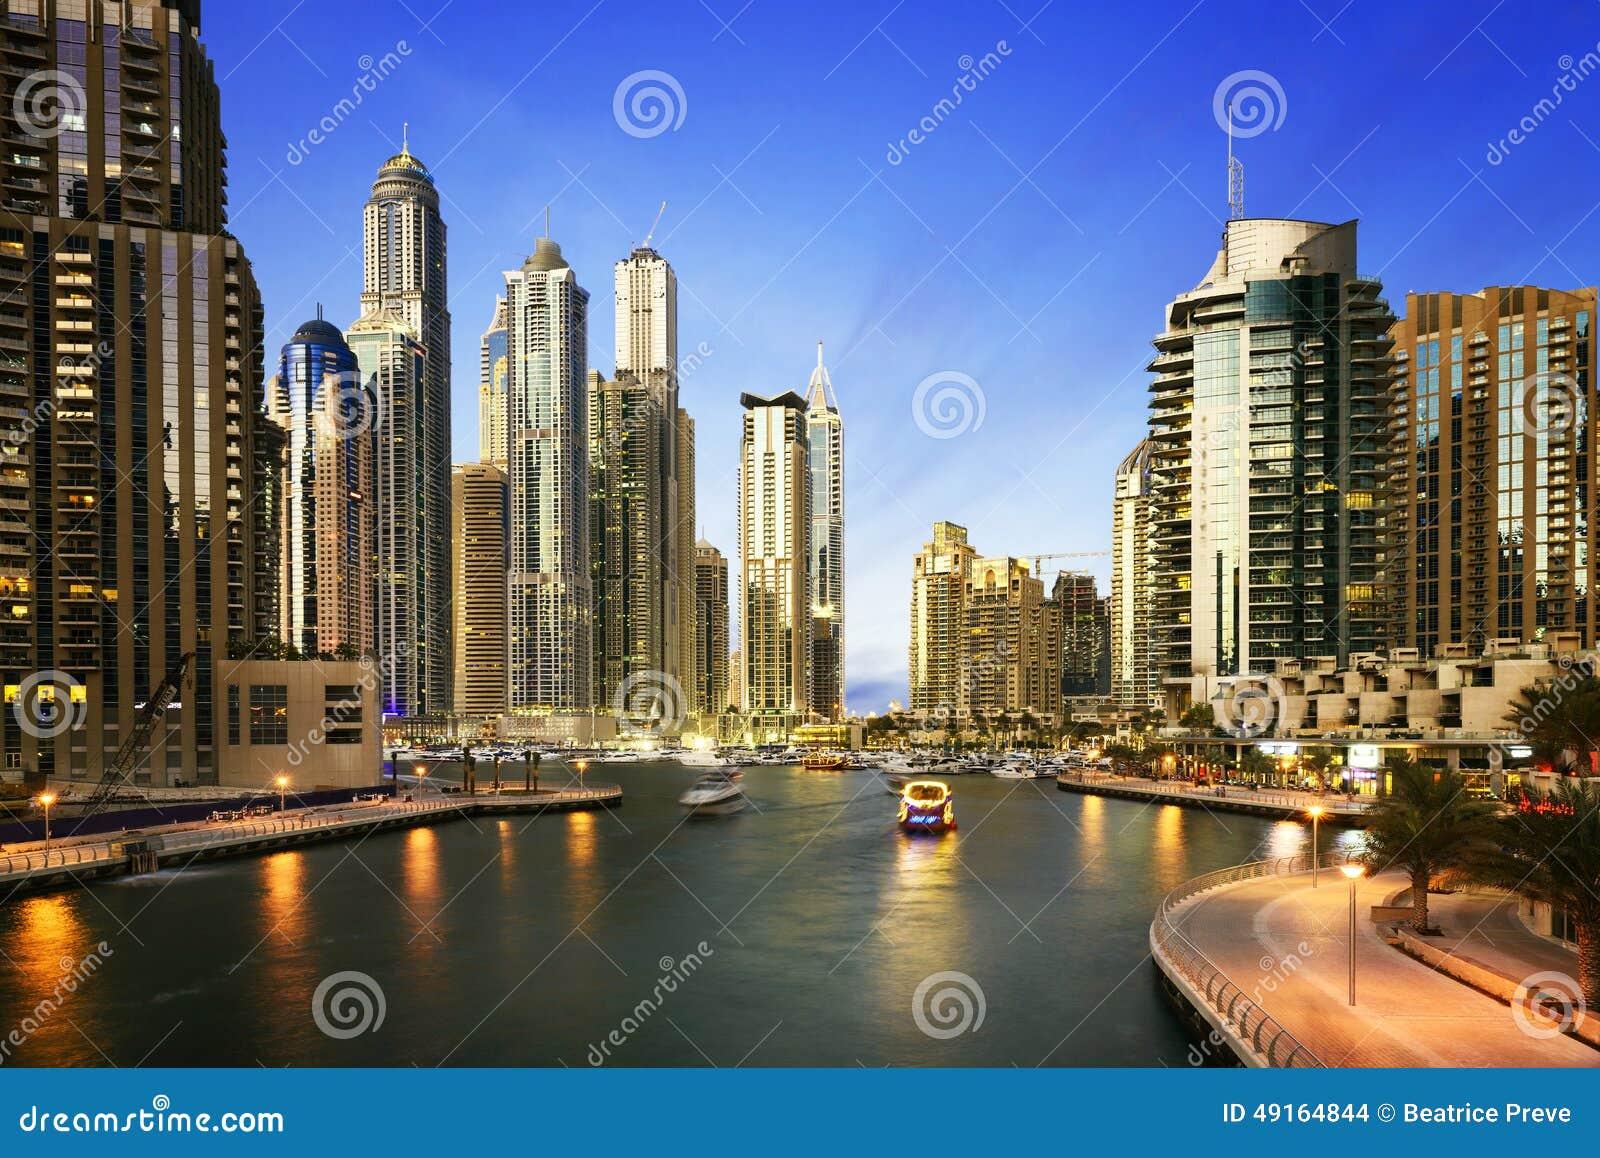 paysage urbain de duba la nuit emirats arabes unis photo stock image 49164844. Black Bedroom Furniture Sets. Home Design Ideas